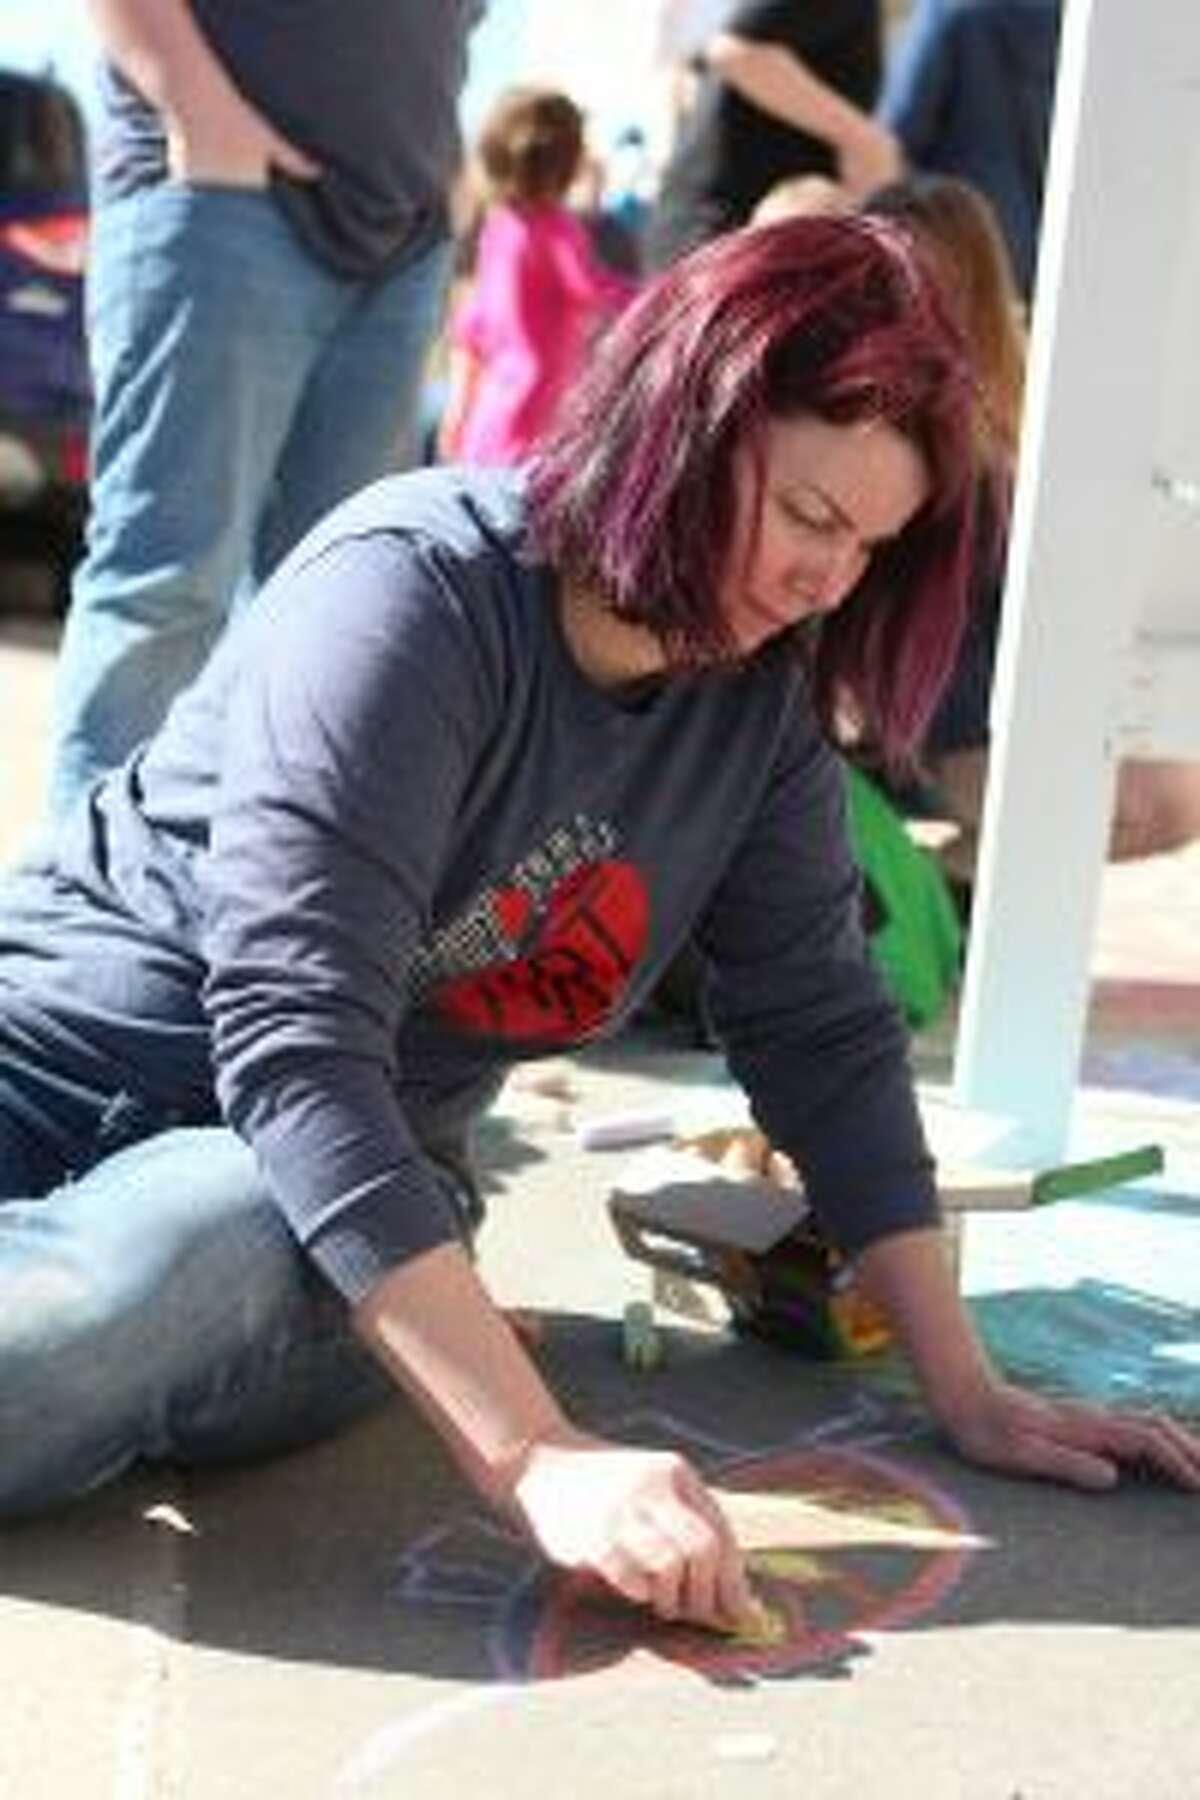 CELEBRATION: Nikki Jorgensen, owner of Heart-full ART Studio, works on a chalk drawing Saturday morning.